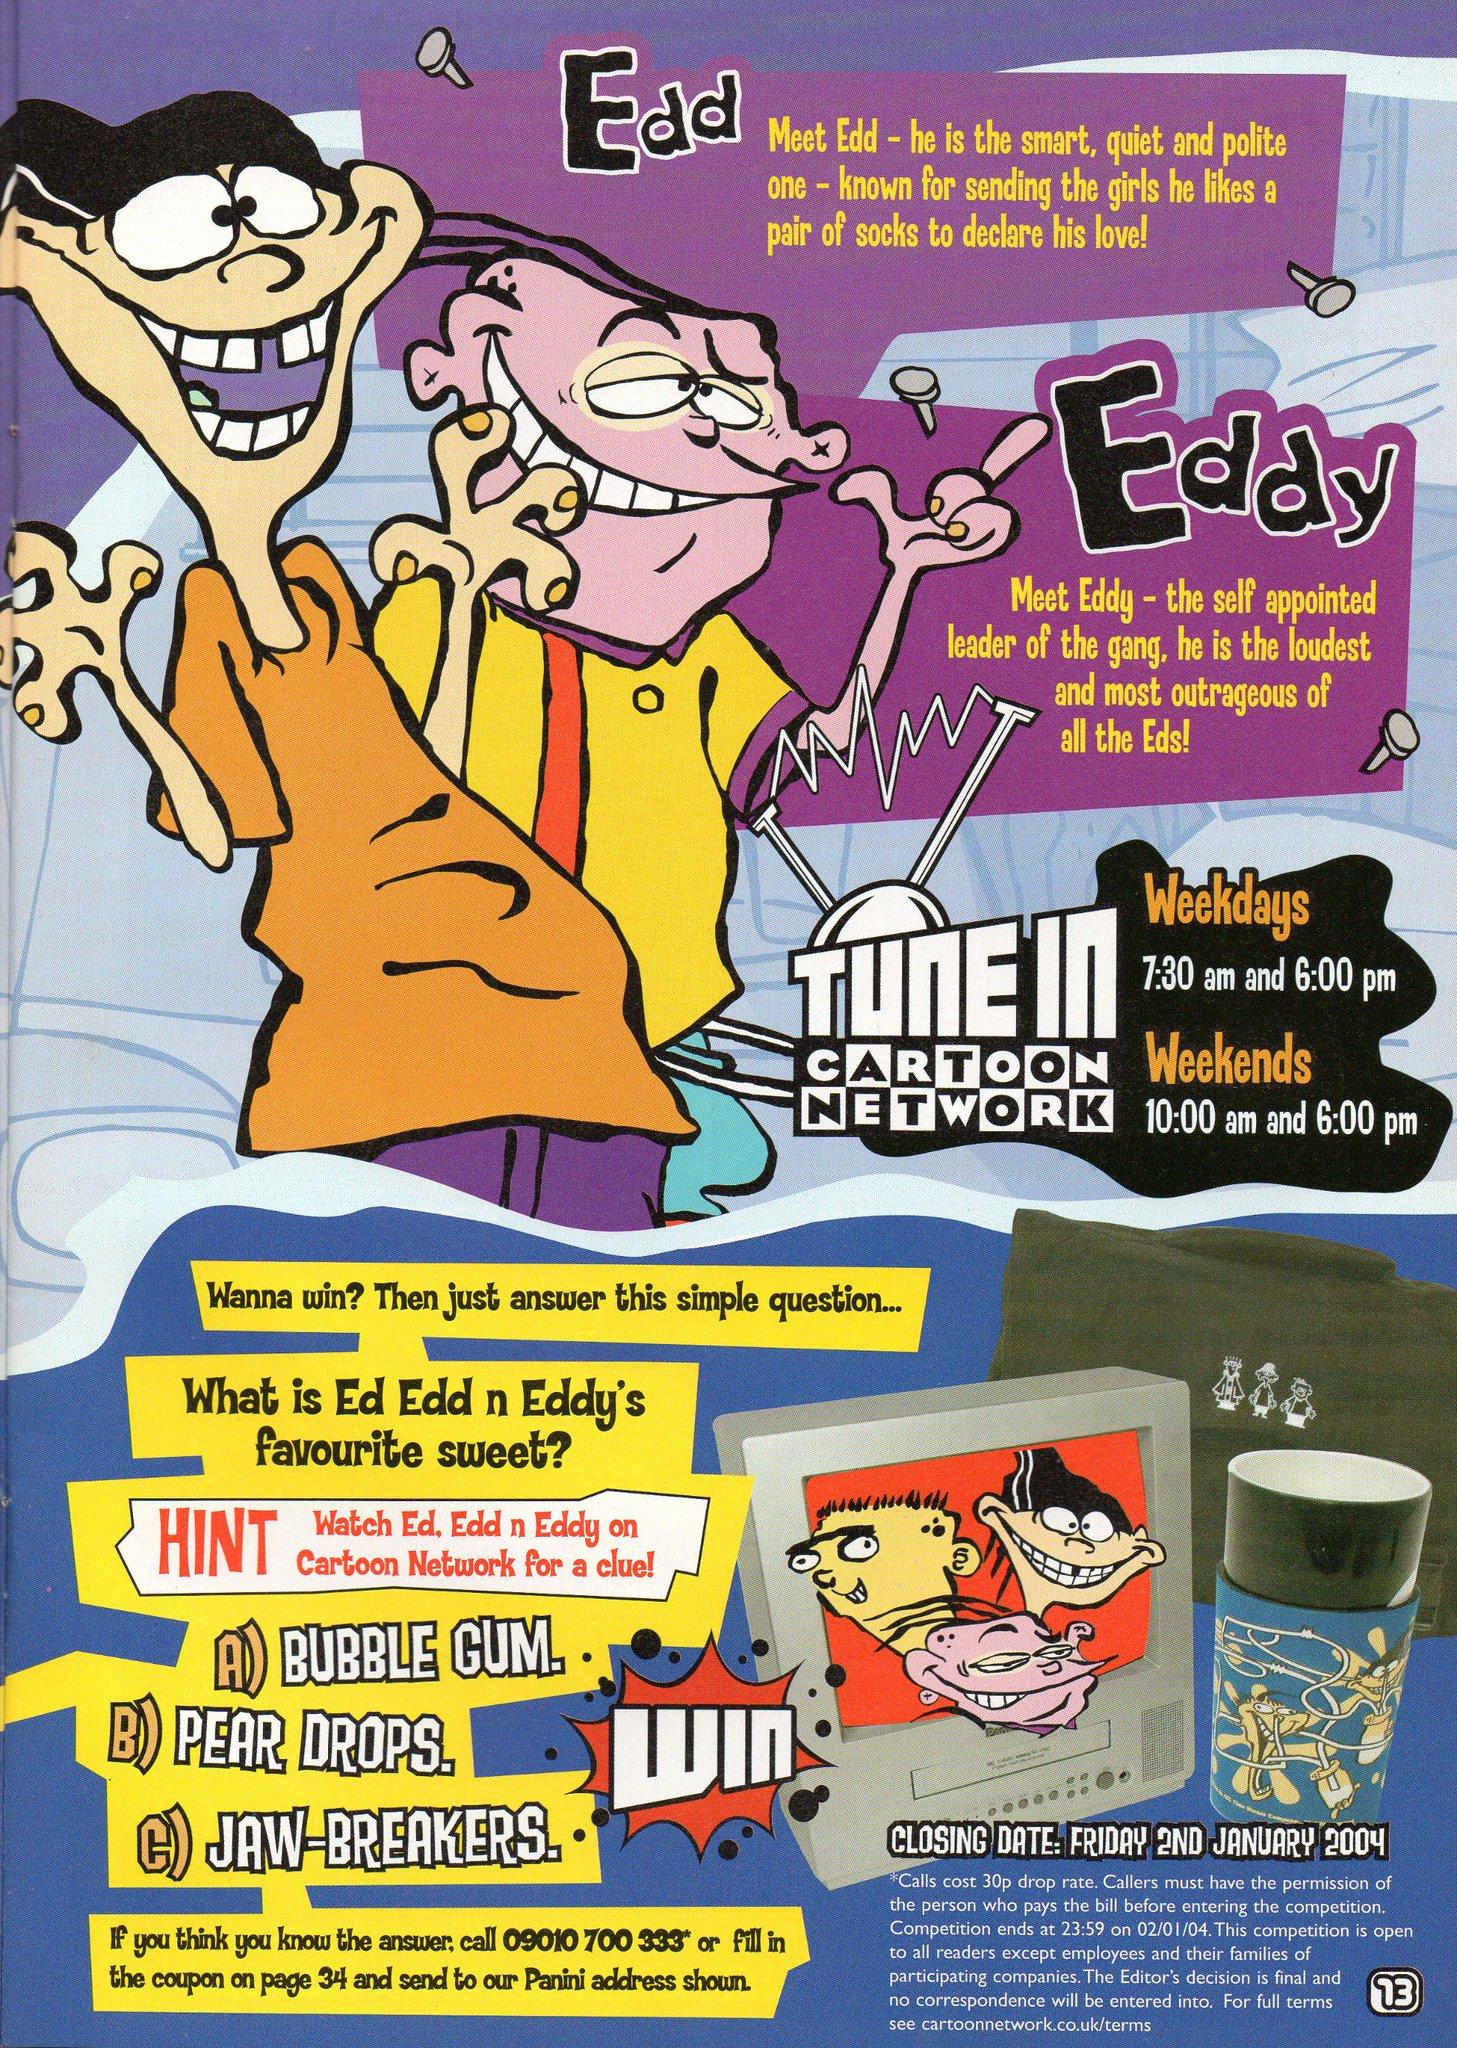 Sam Jo Flewellen On Twitter Meet Ededdneddy Cartoon Network Magazine Uk Advert